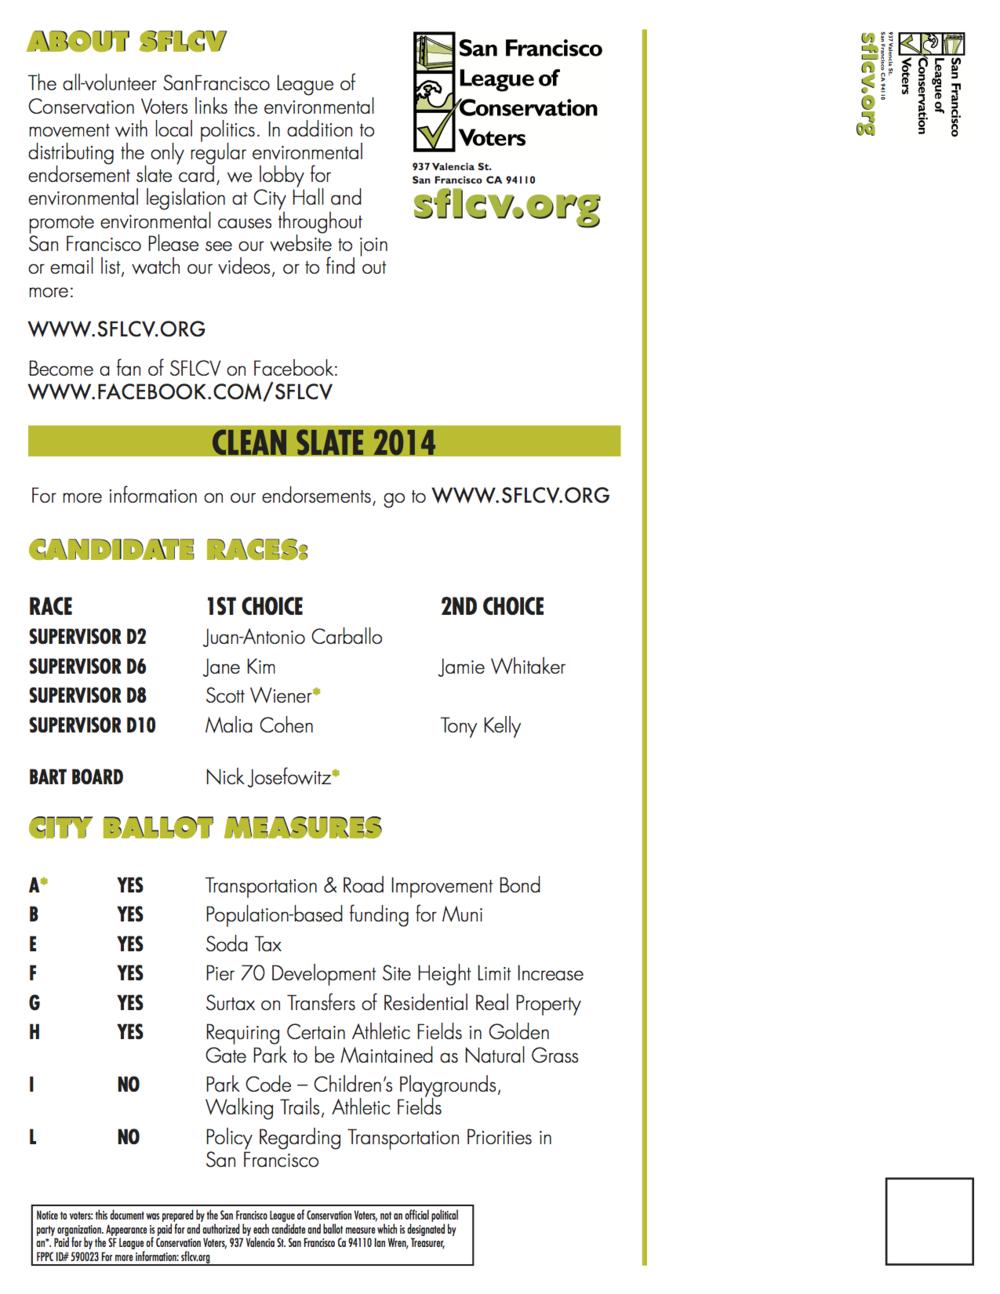 November 2010 District 6 SFLCV slater mailer